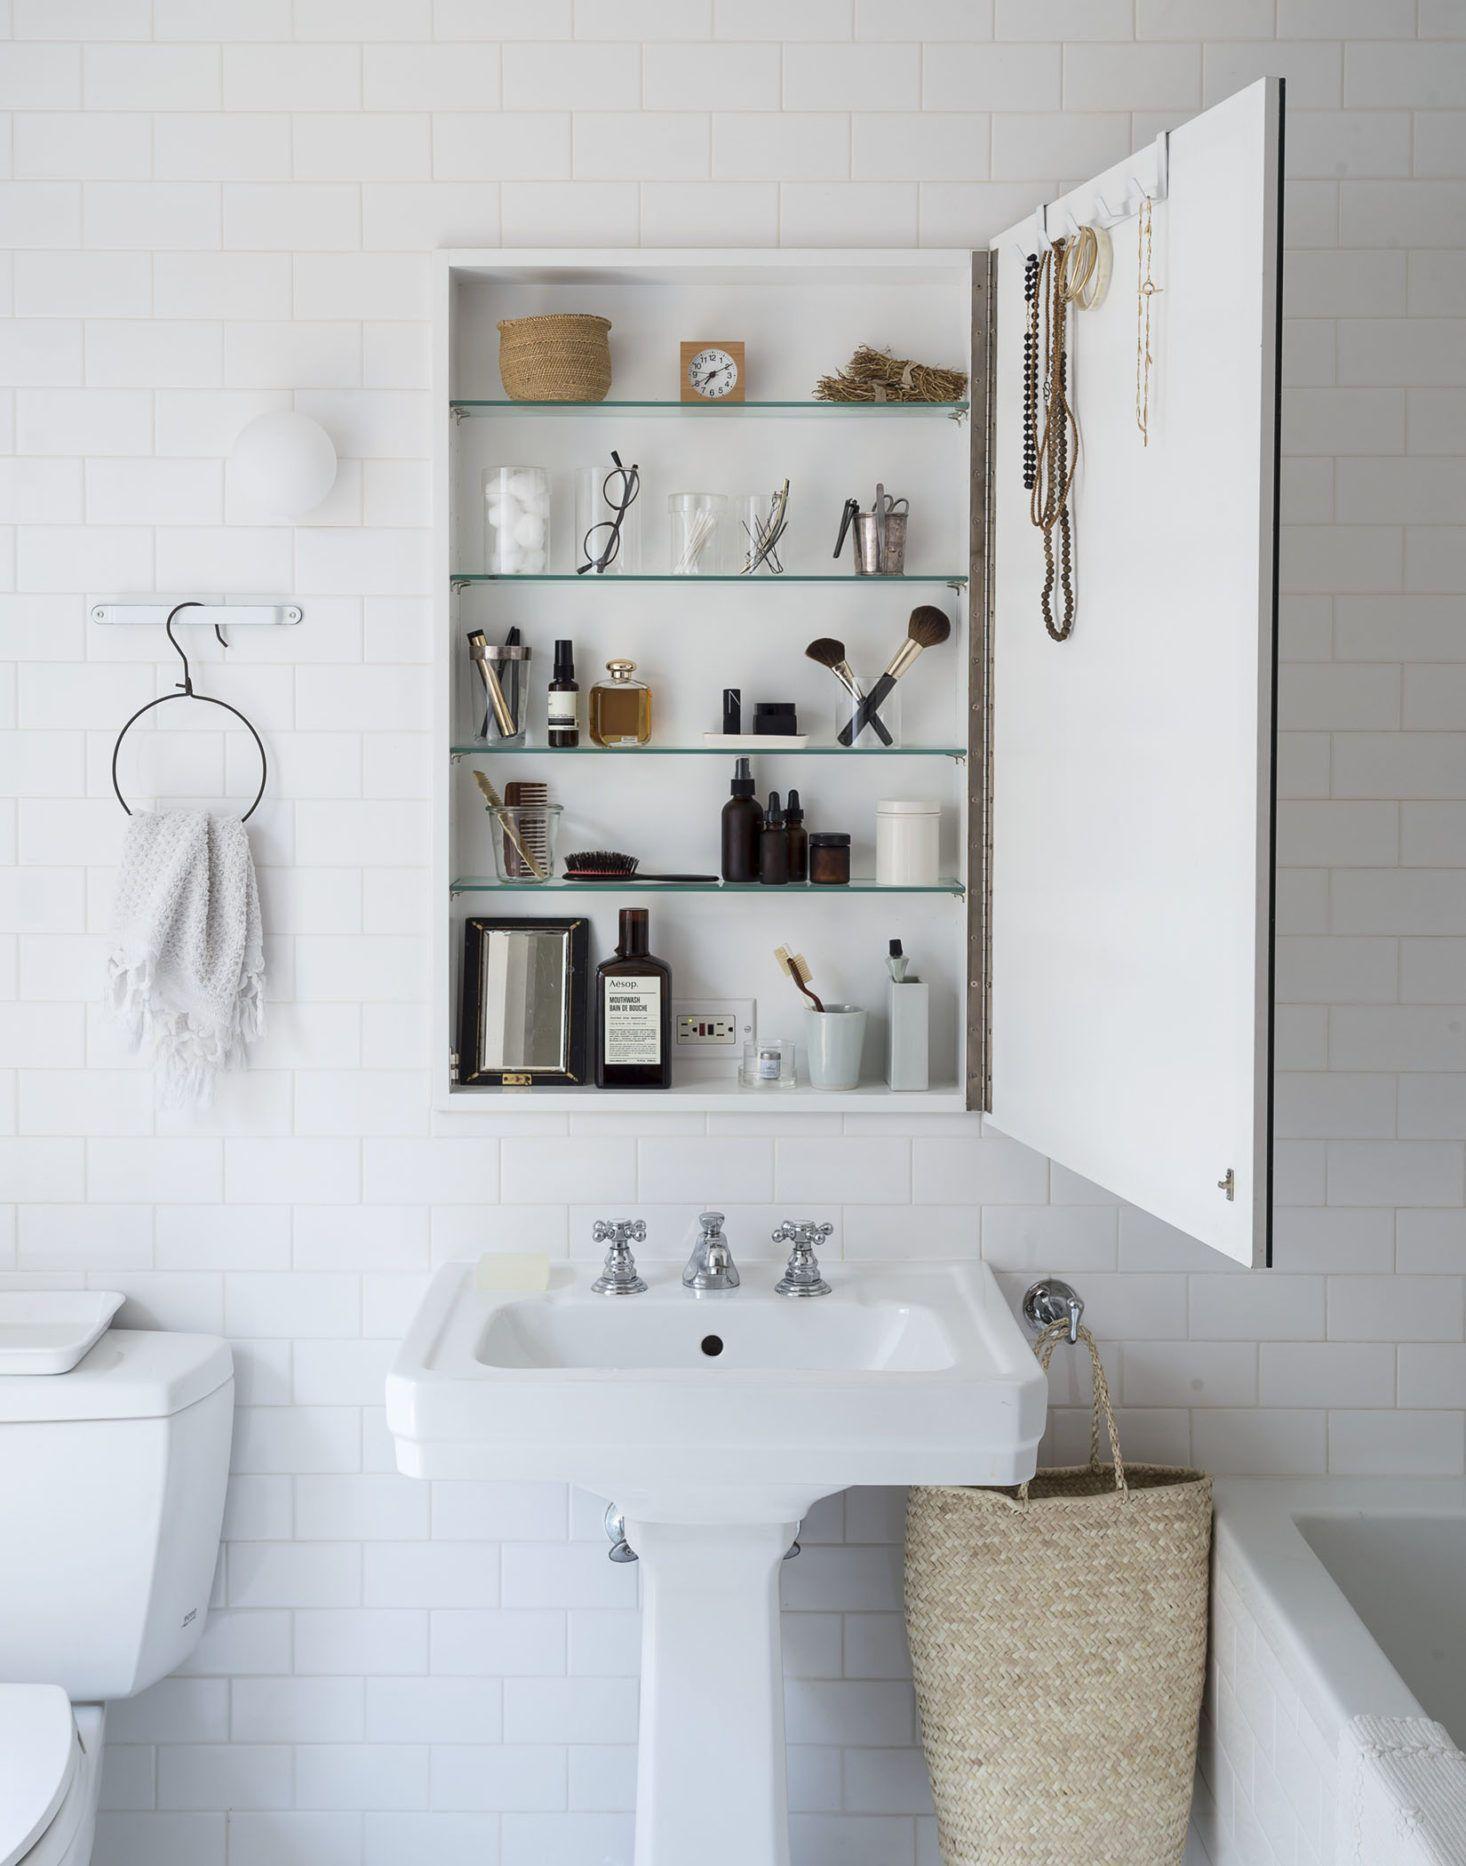 44+ Medicine cabinet ideas for small bathroom type